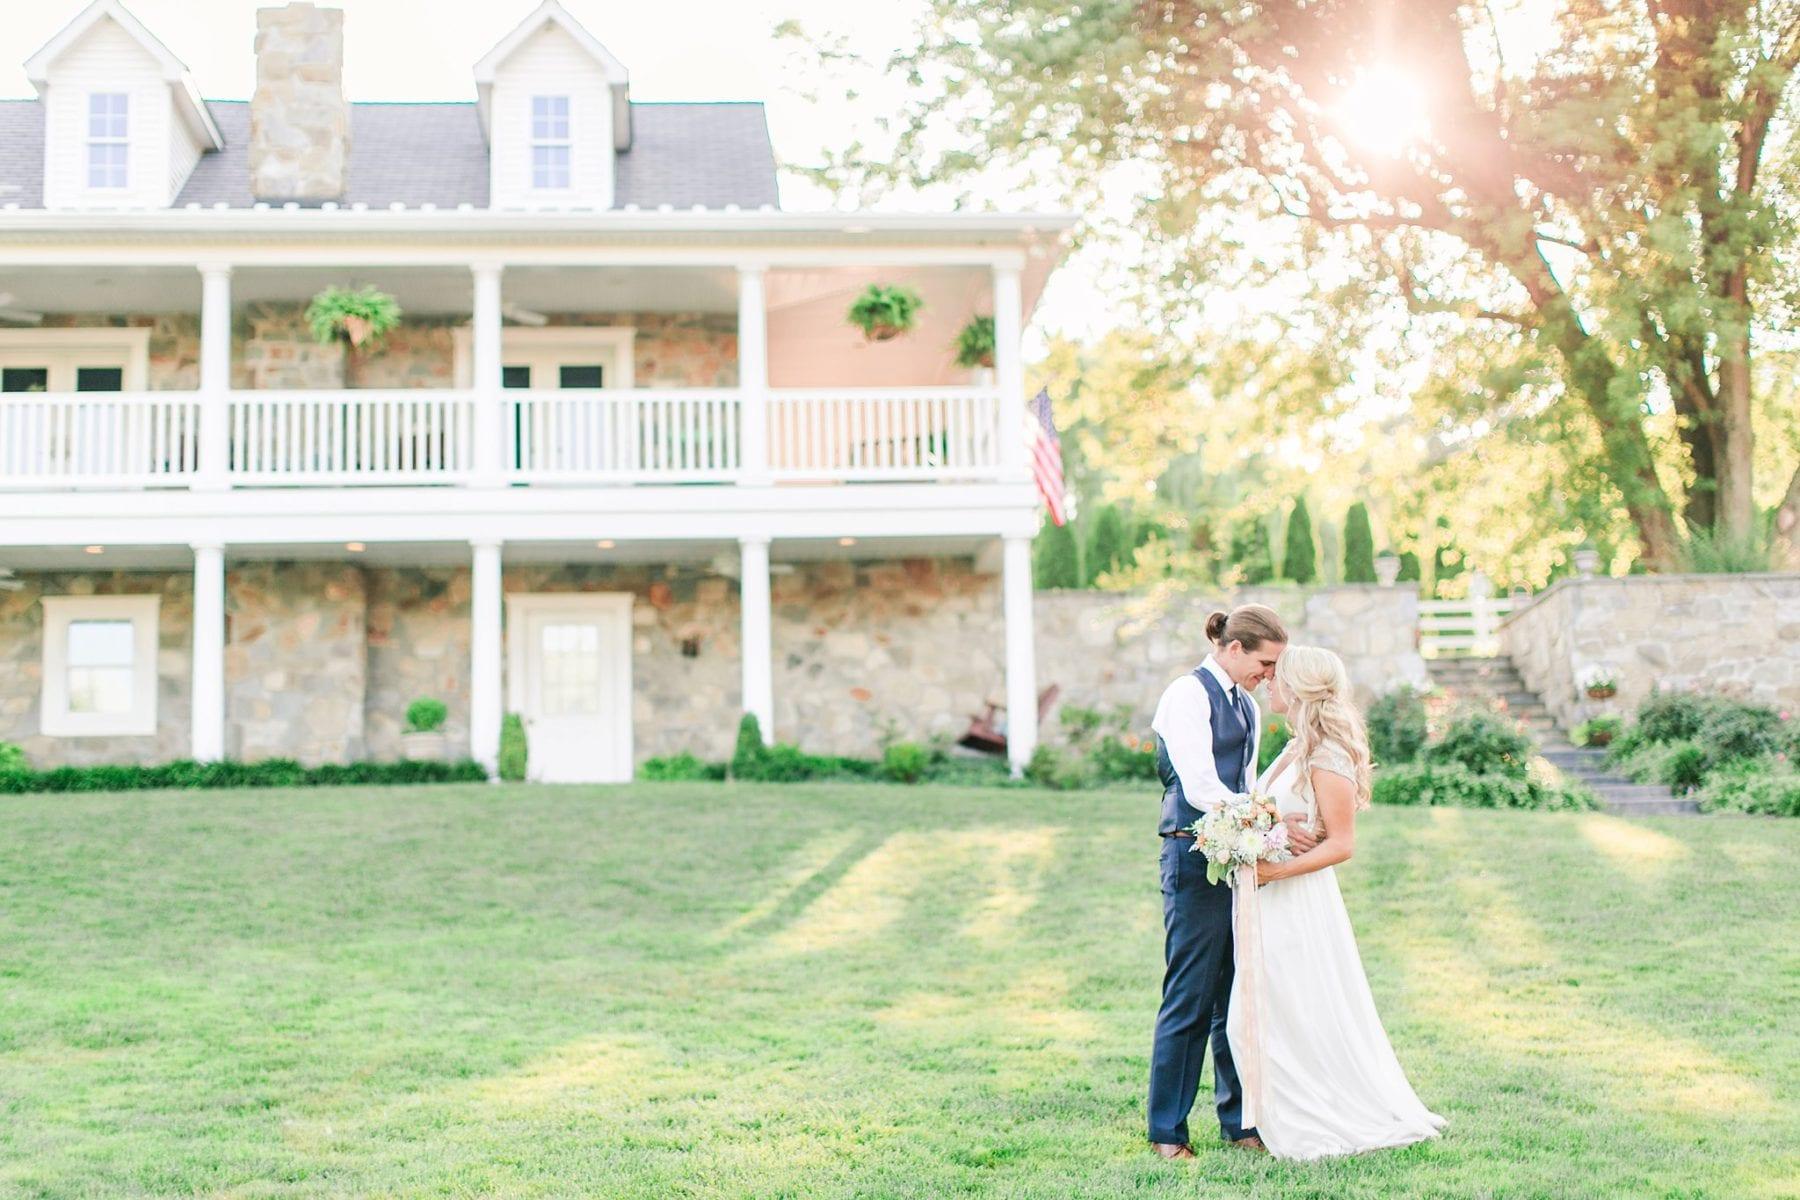 Pond View Farm Wedding Photos Maryland Wedding Photographer Kristen & Ryan Megan Kelsey Photography Blog-241.jpg